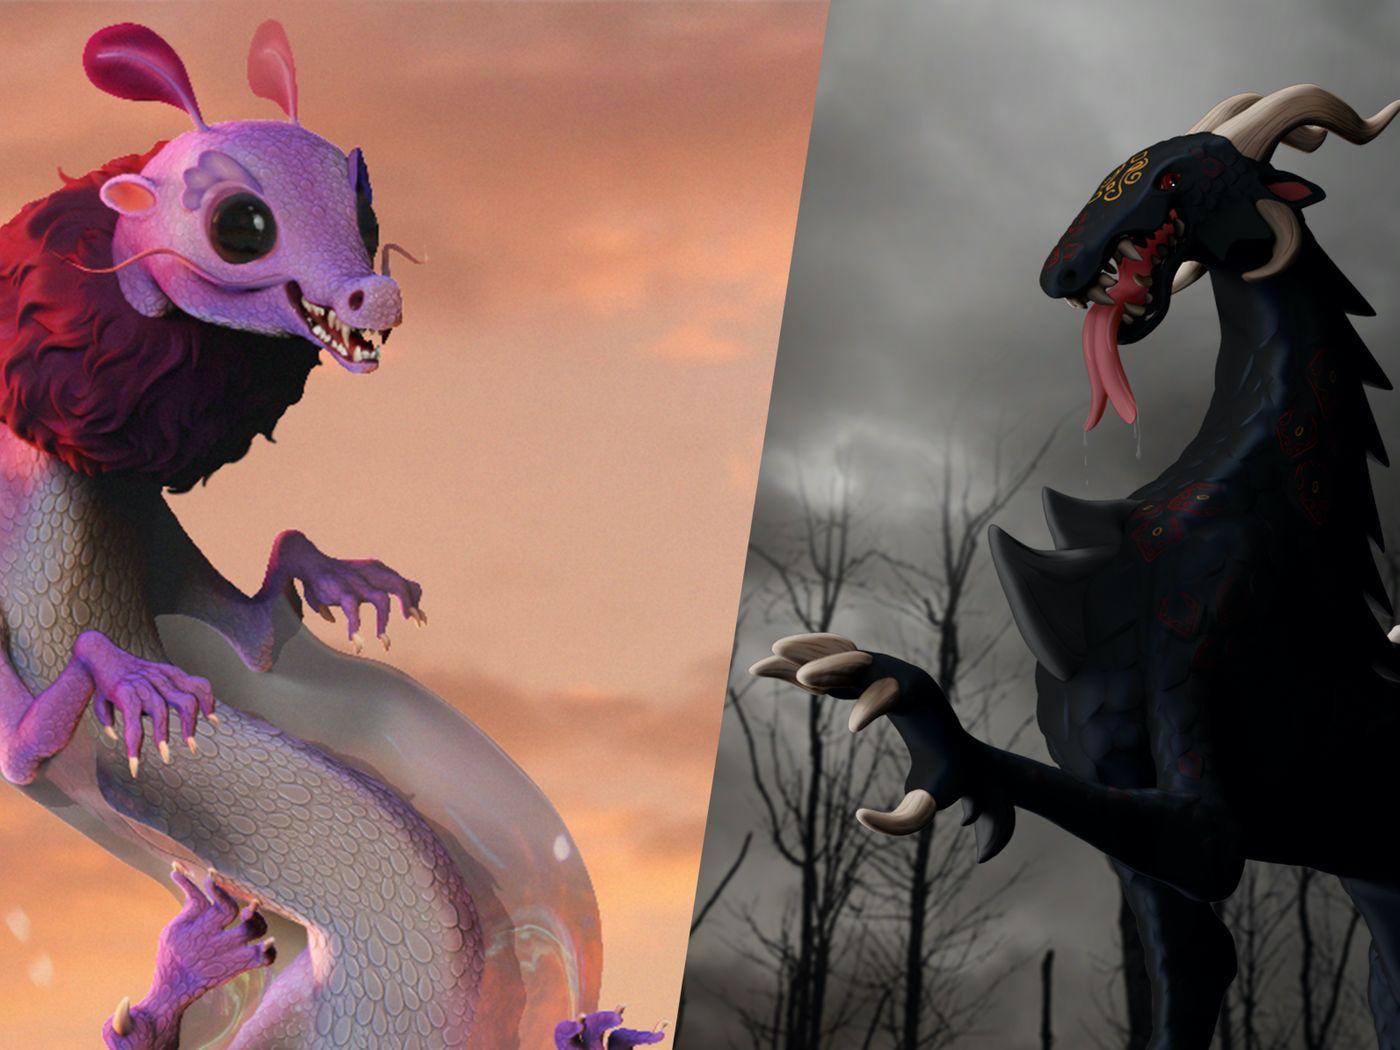 Creature Design- Dusk and Heraldic Dragon Concepts